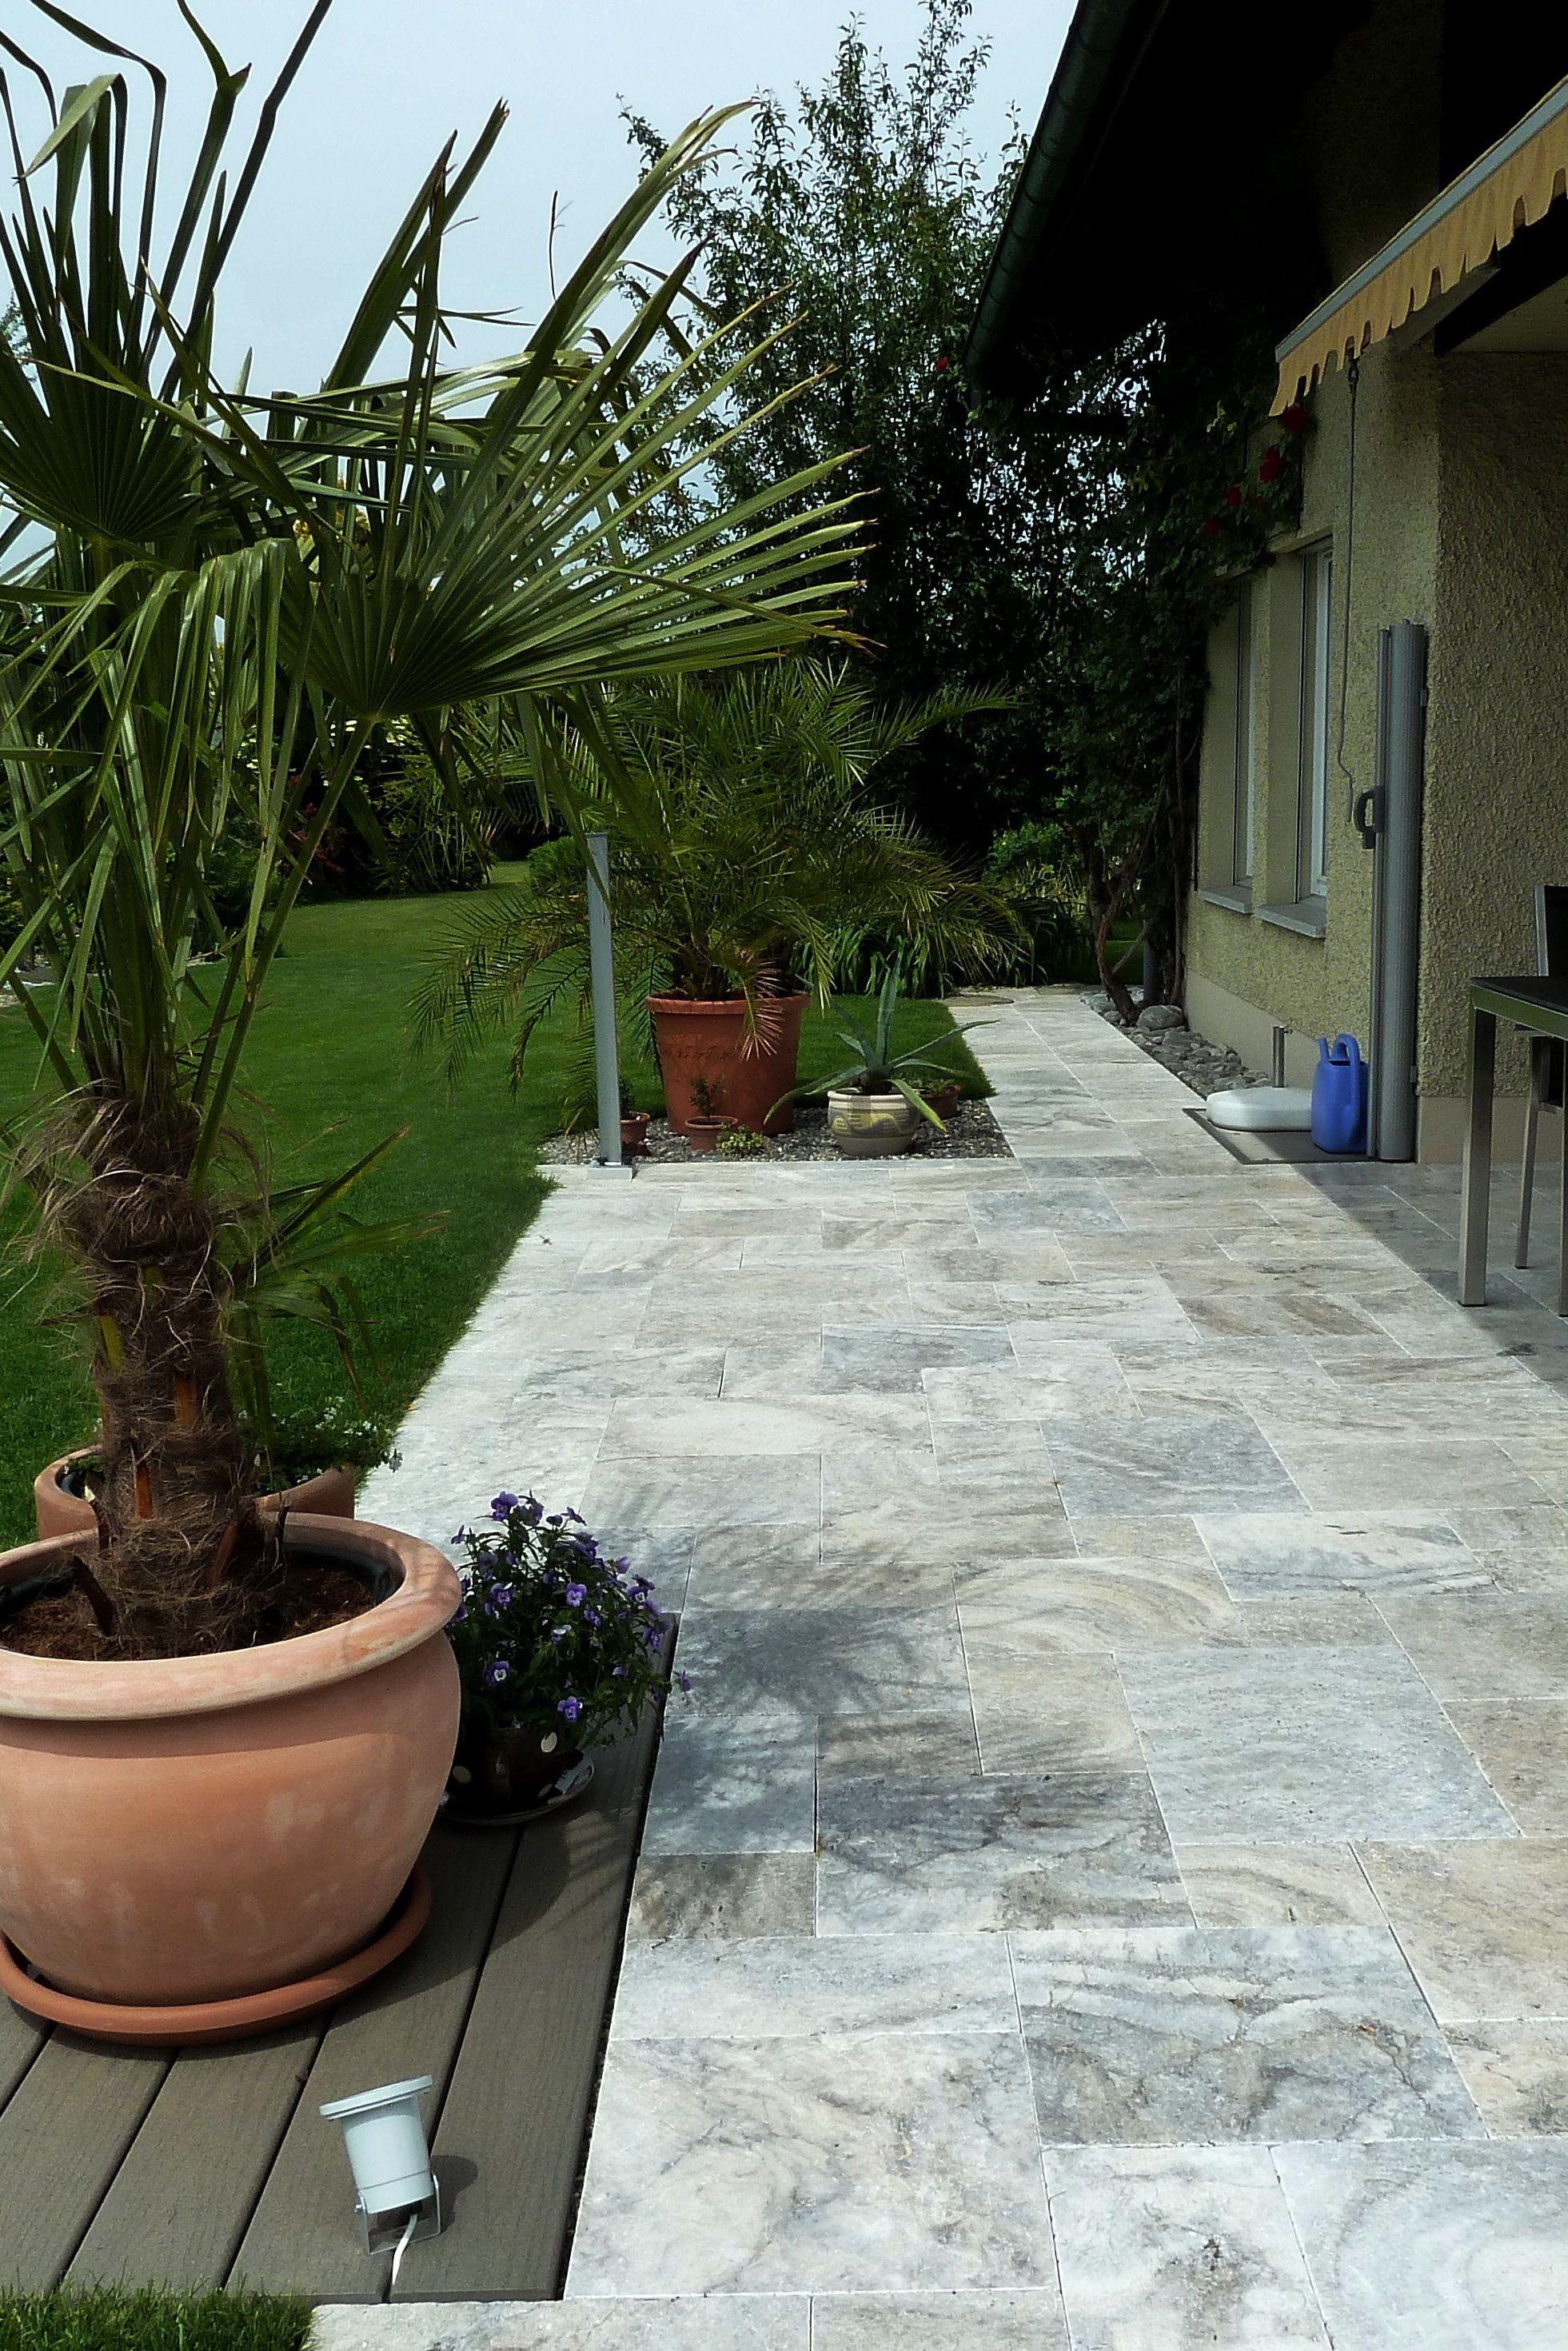 Travertin Silver Terrassenplatten. #wohnrausch #travertin #natursteine  #terrassenplatten #mauersteine #fliesen